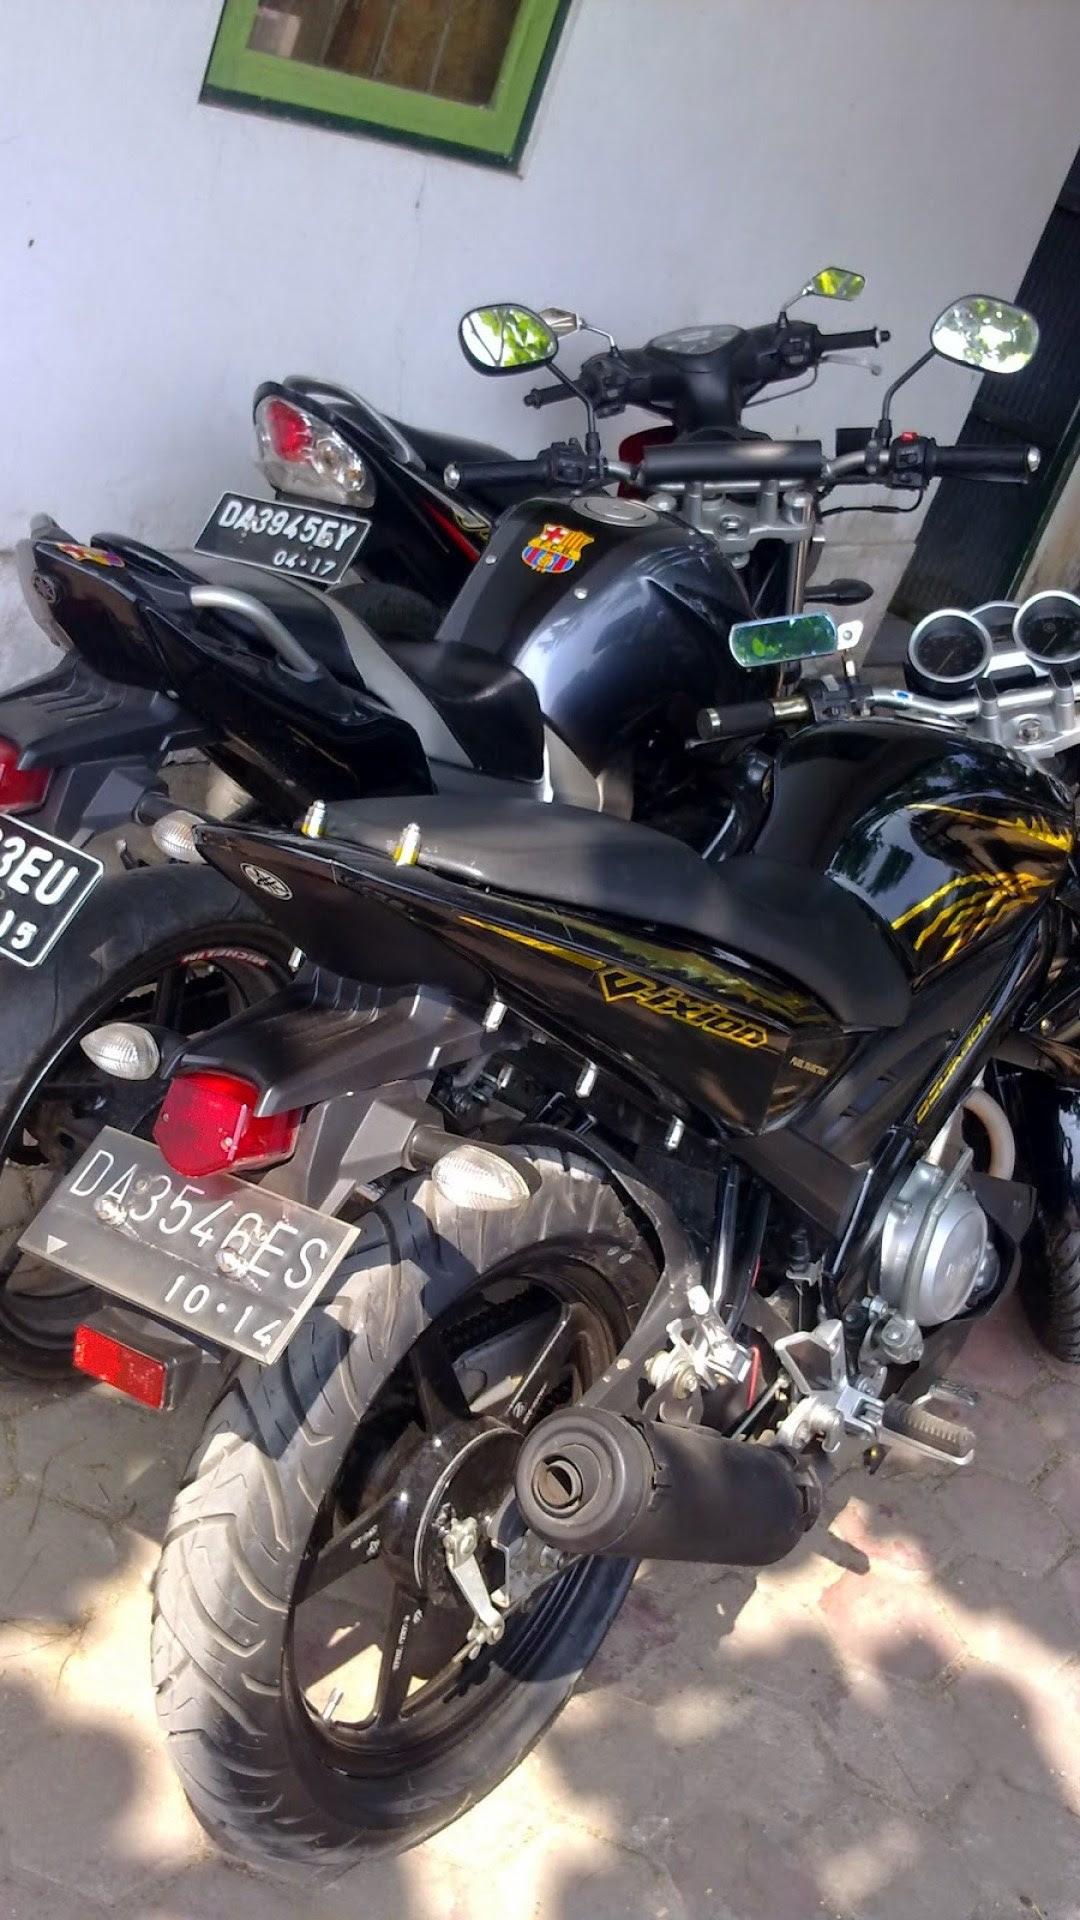 86 Modifikasi Motor Byson Stang Jepit Terunik Kempoul Motor